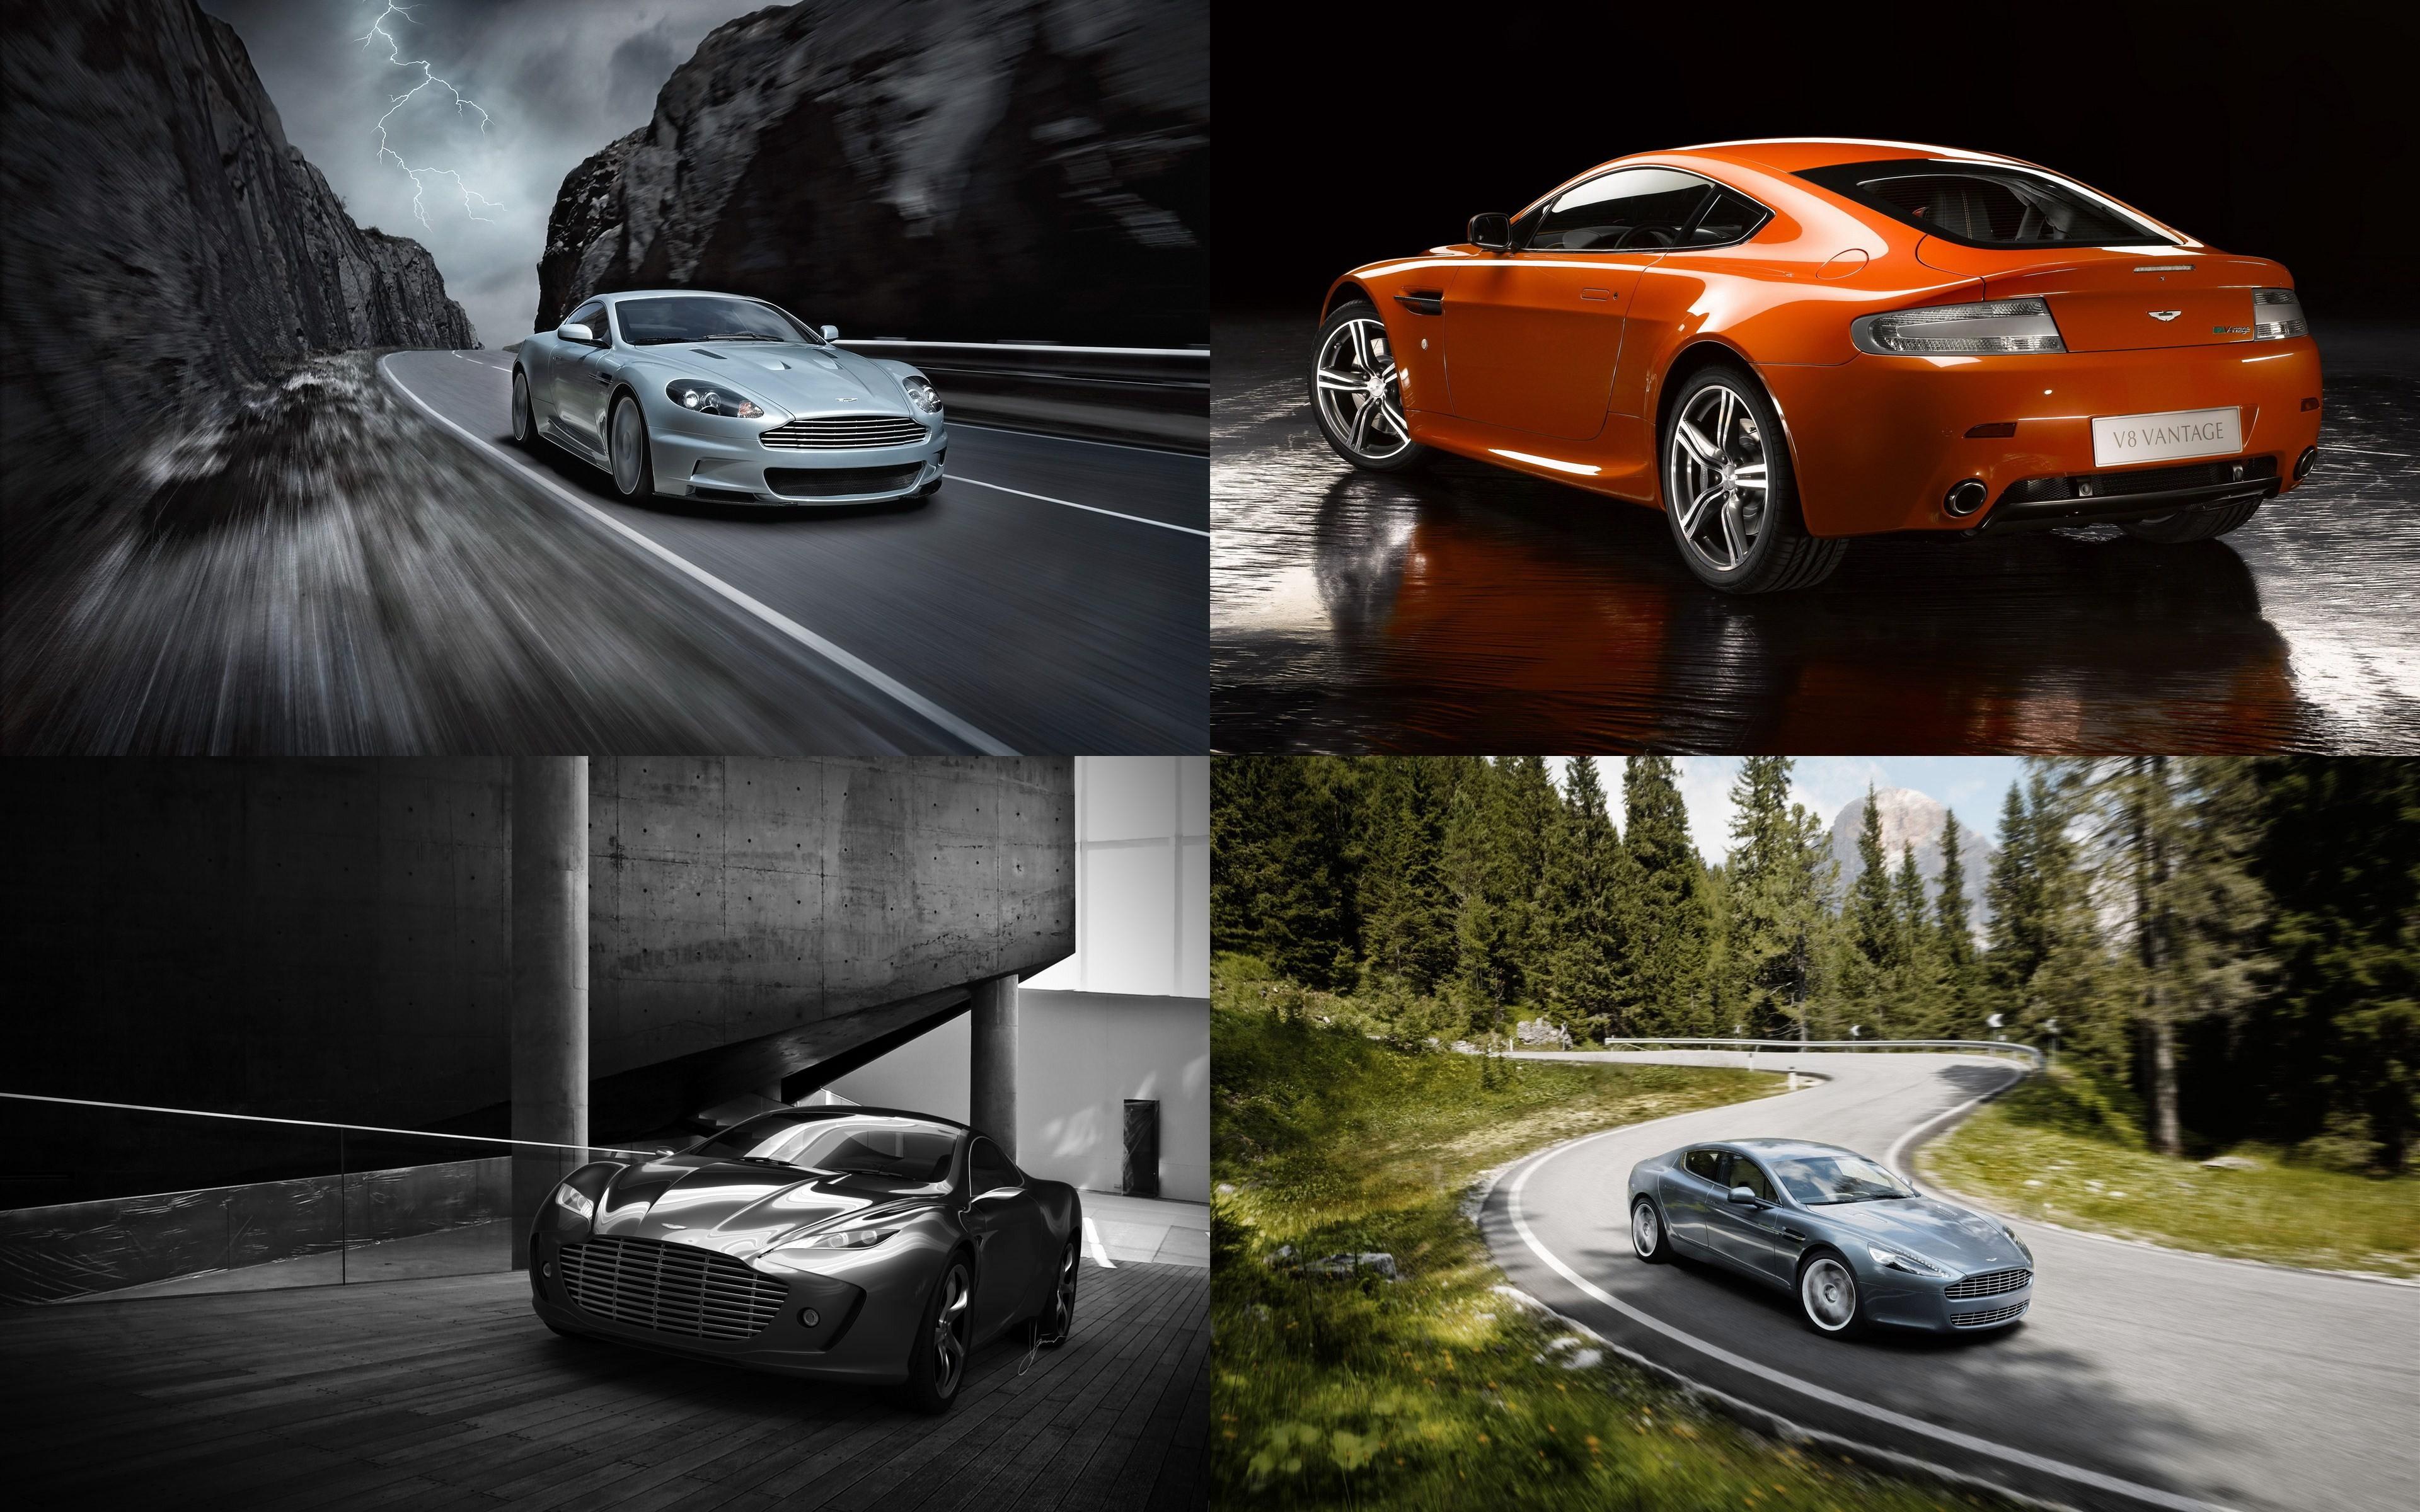 Коллекция автомобилей Aston Martin